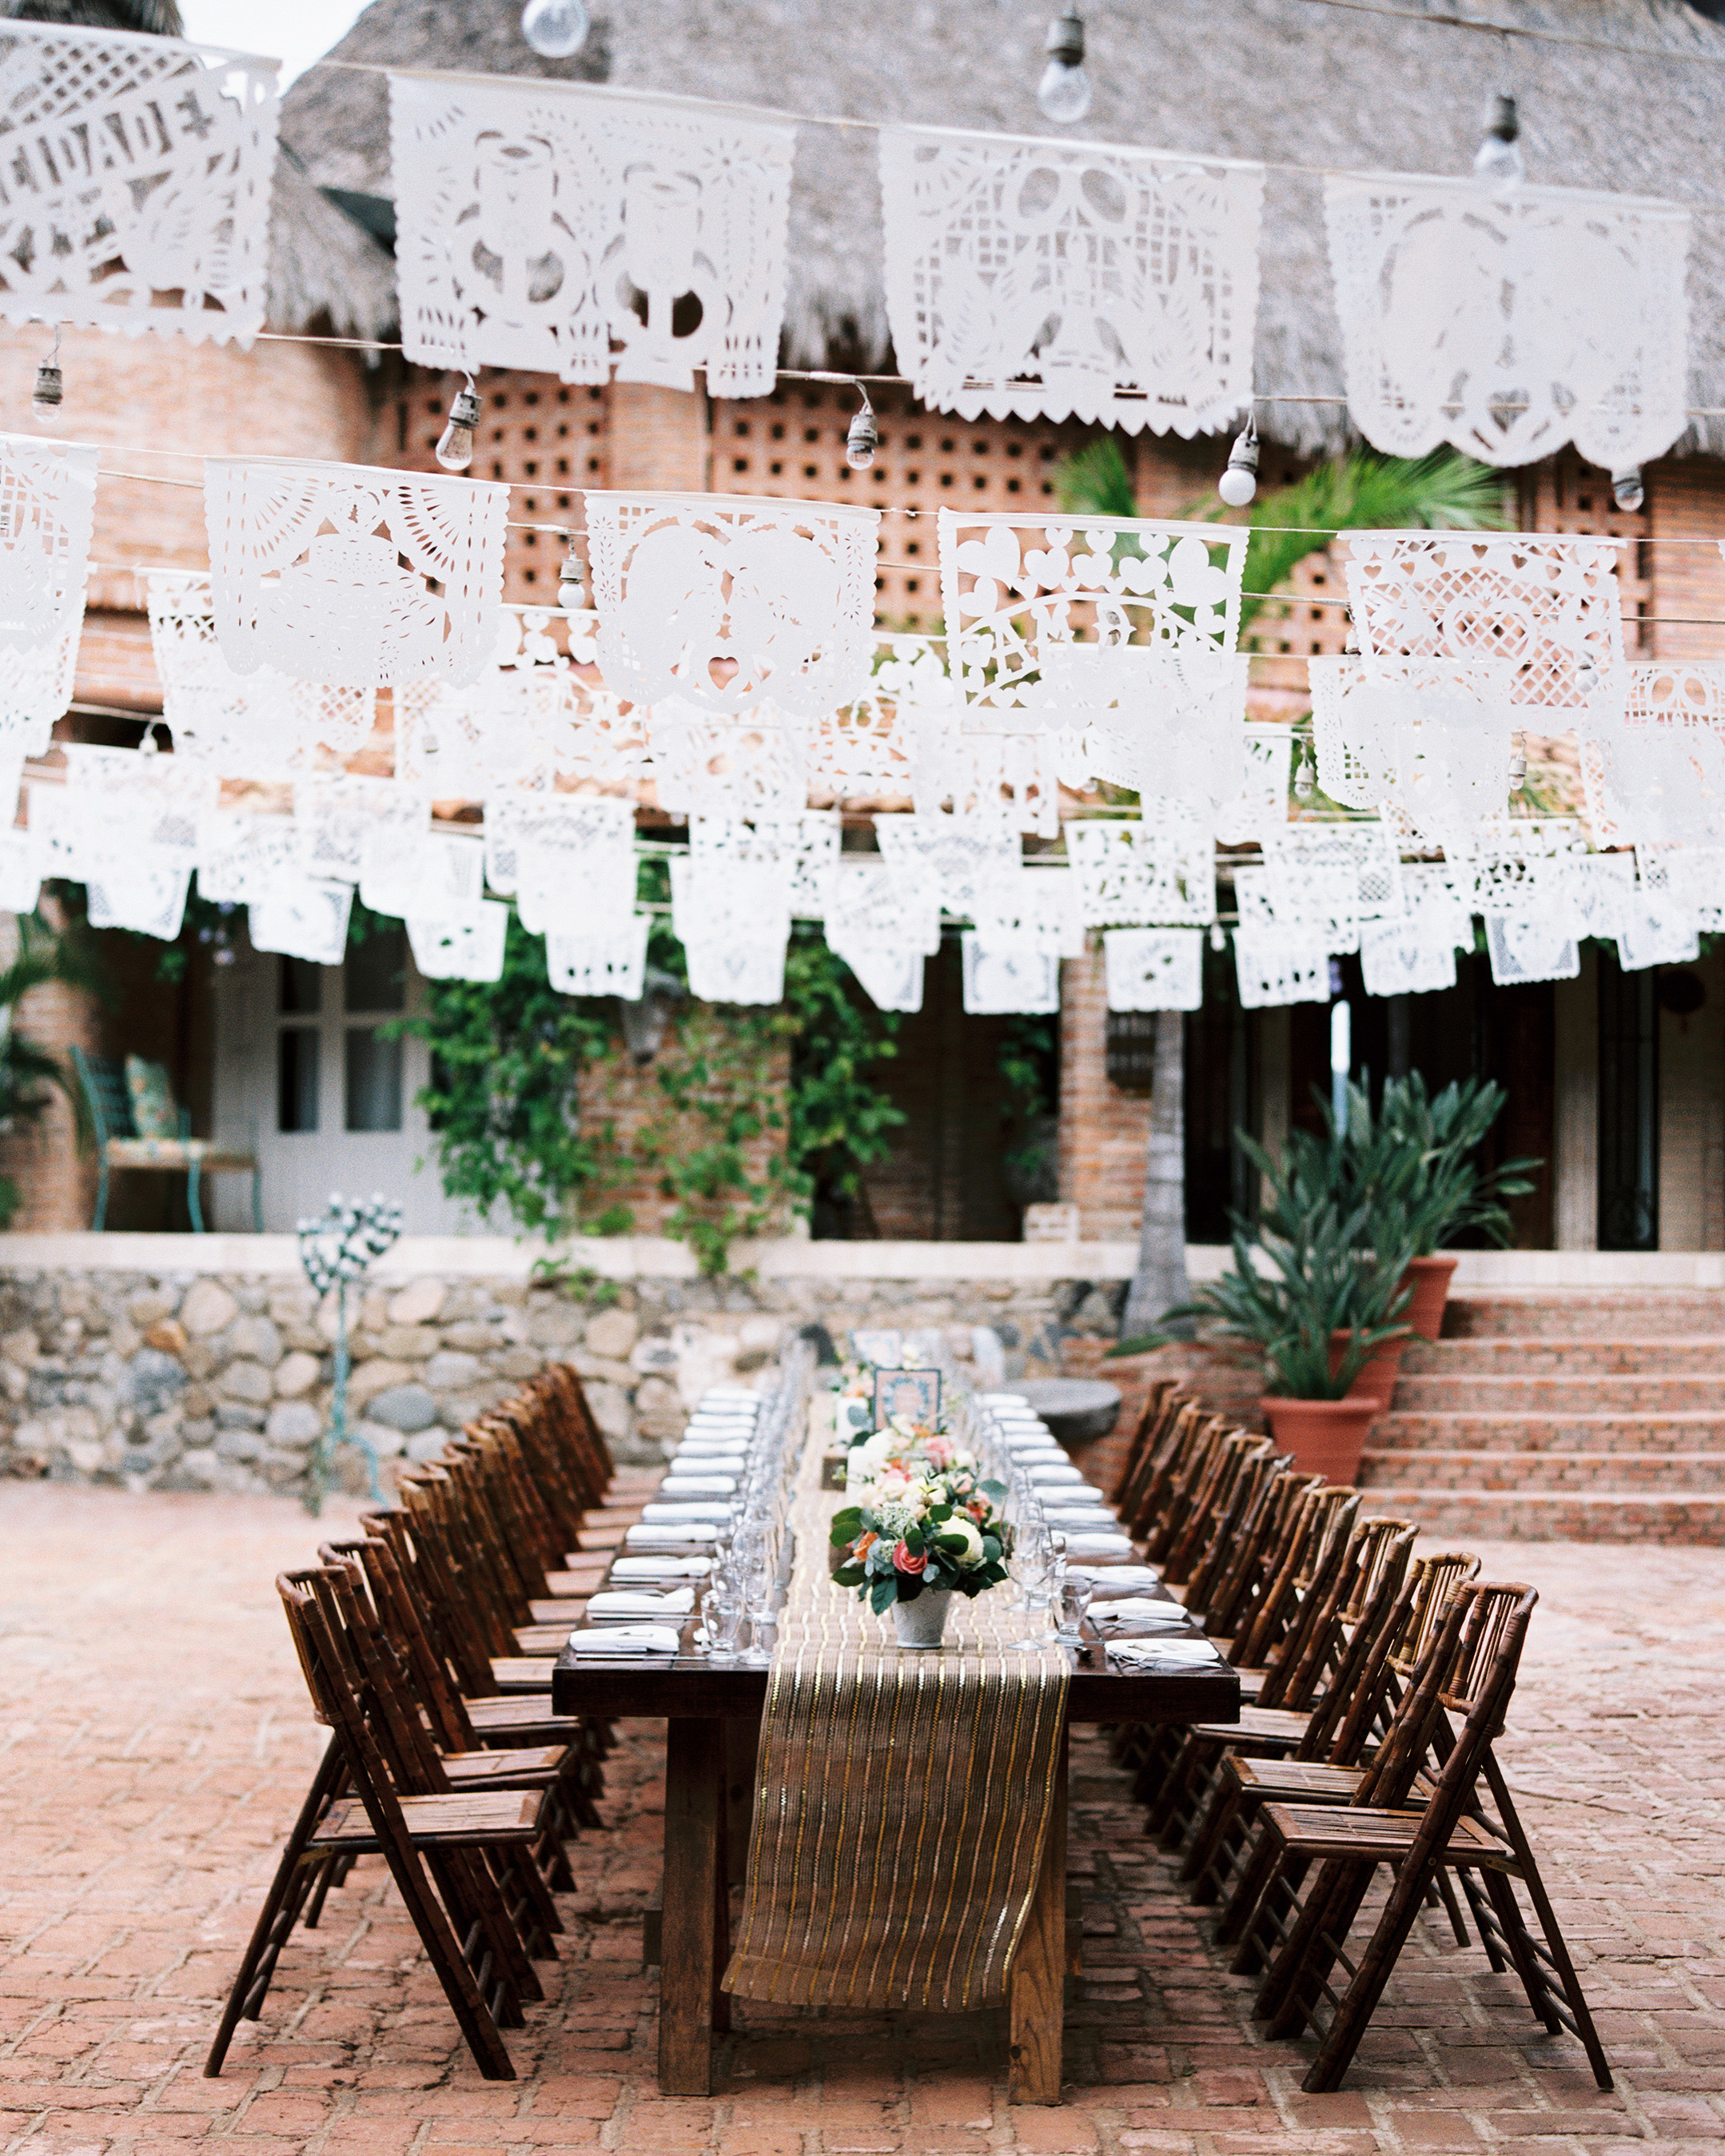 rebecca-eji-wedding-table-papel-picado-134-s113057-0616.jpg